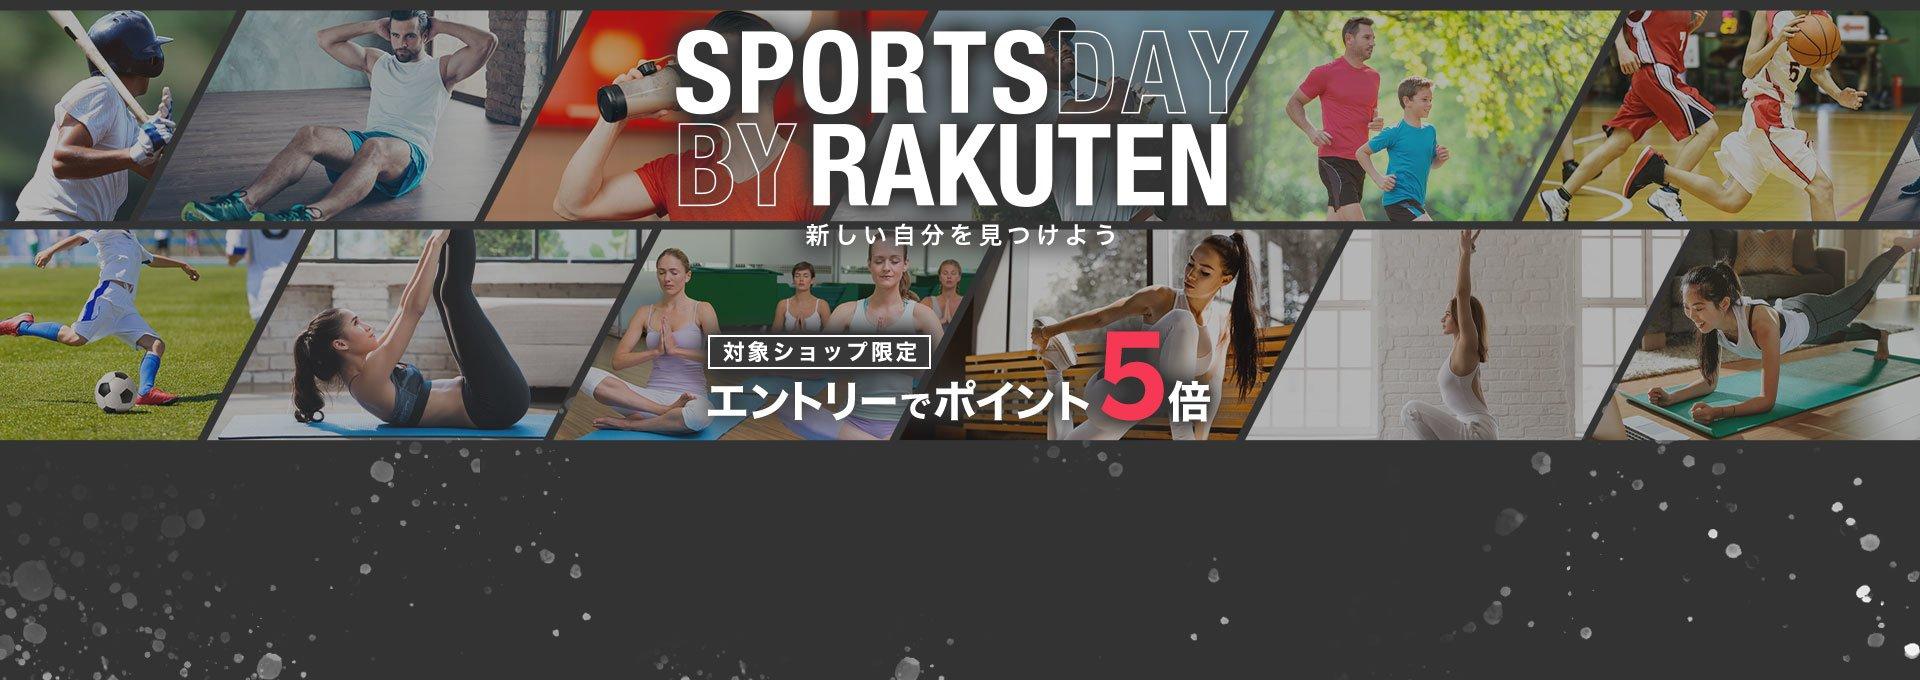 SPORTS DAY BY RAKUTEN